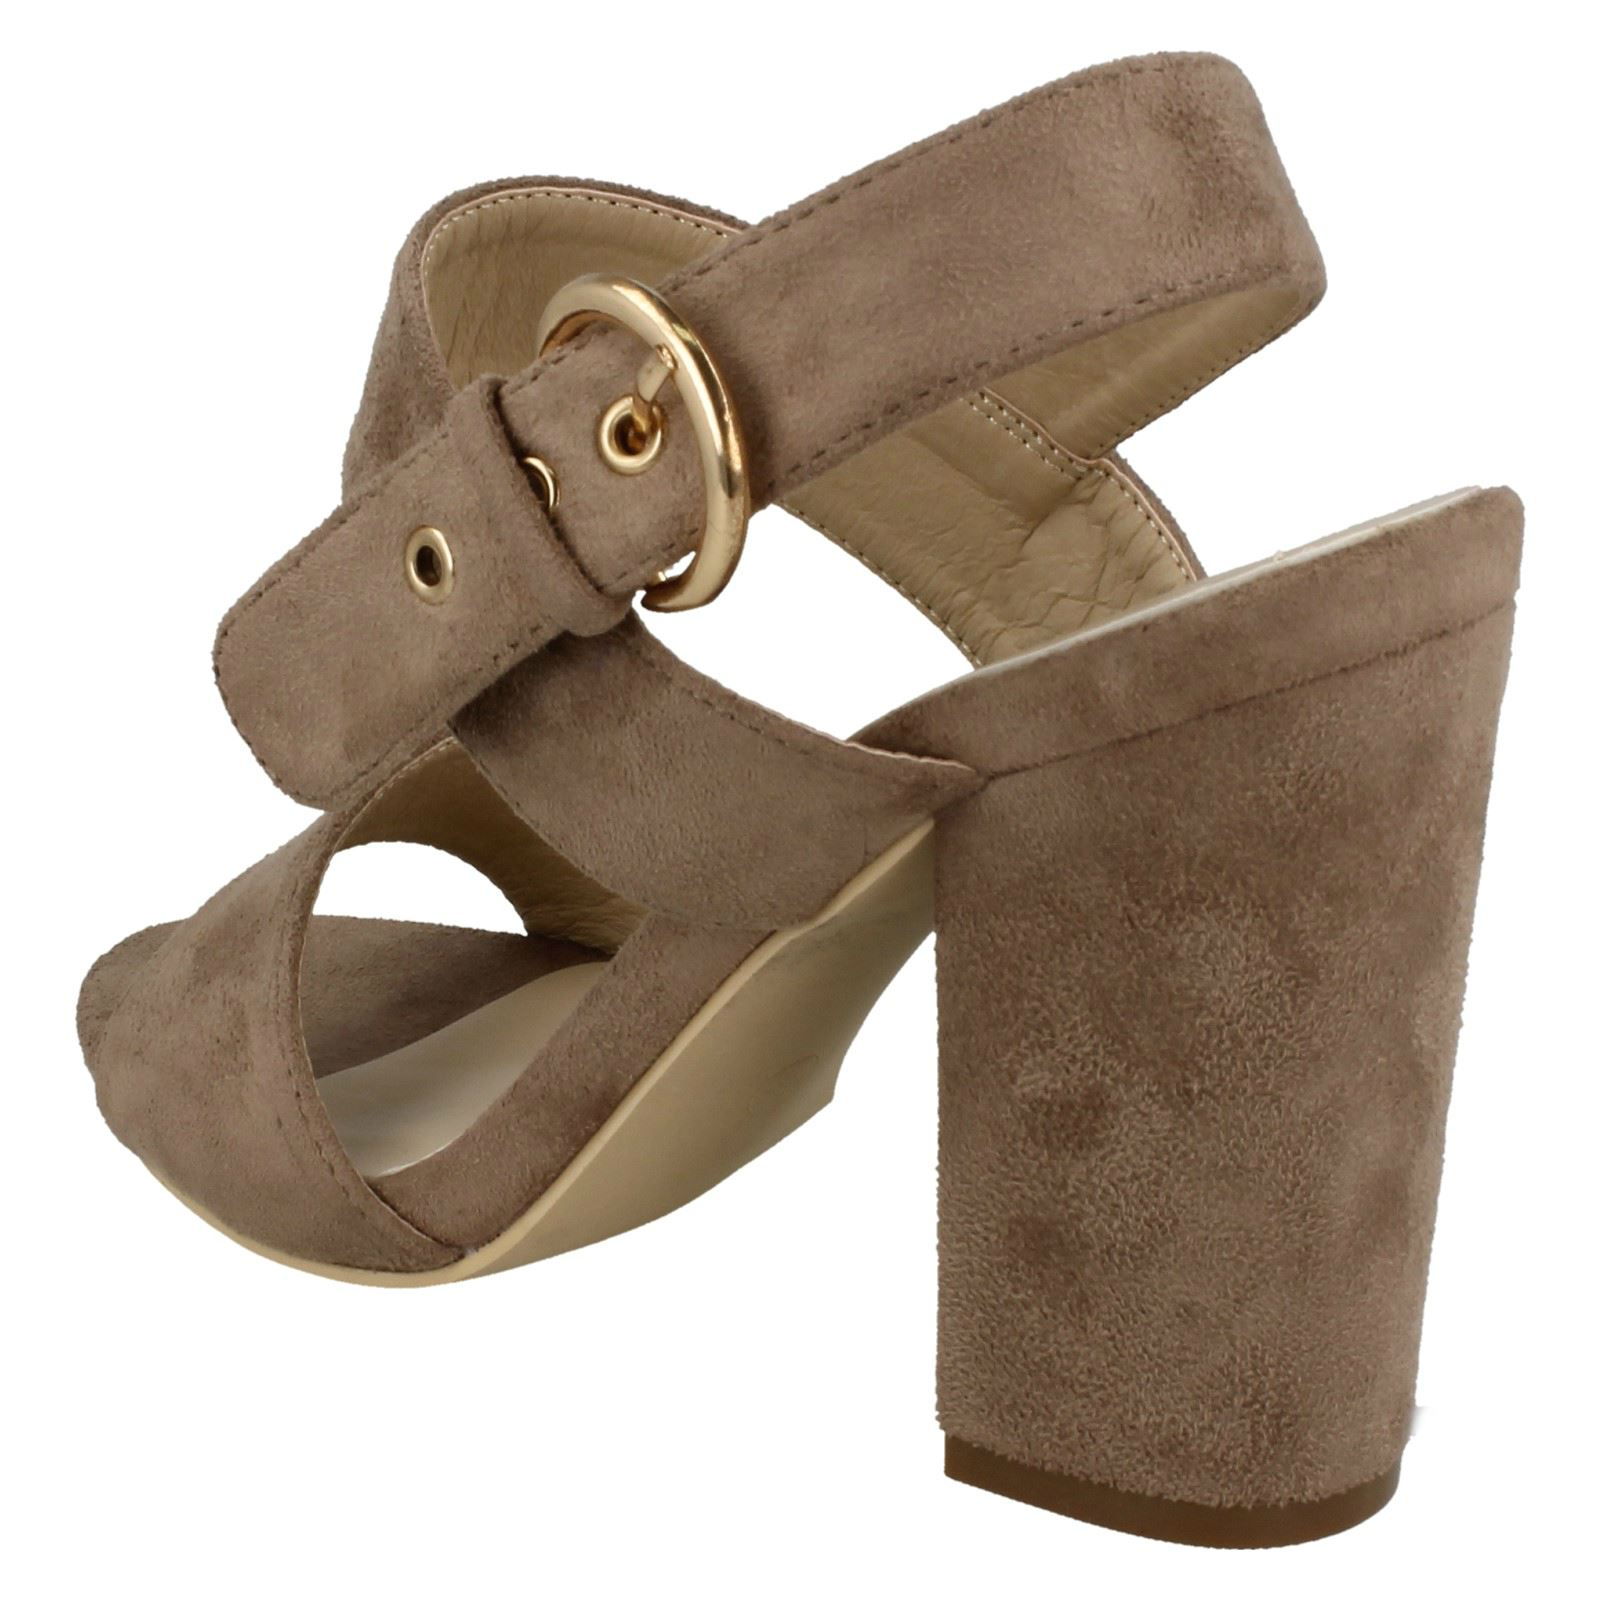 Mule Nude Heel Michelle Sandals High Anne beige Ladies IwqvxFIBO